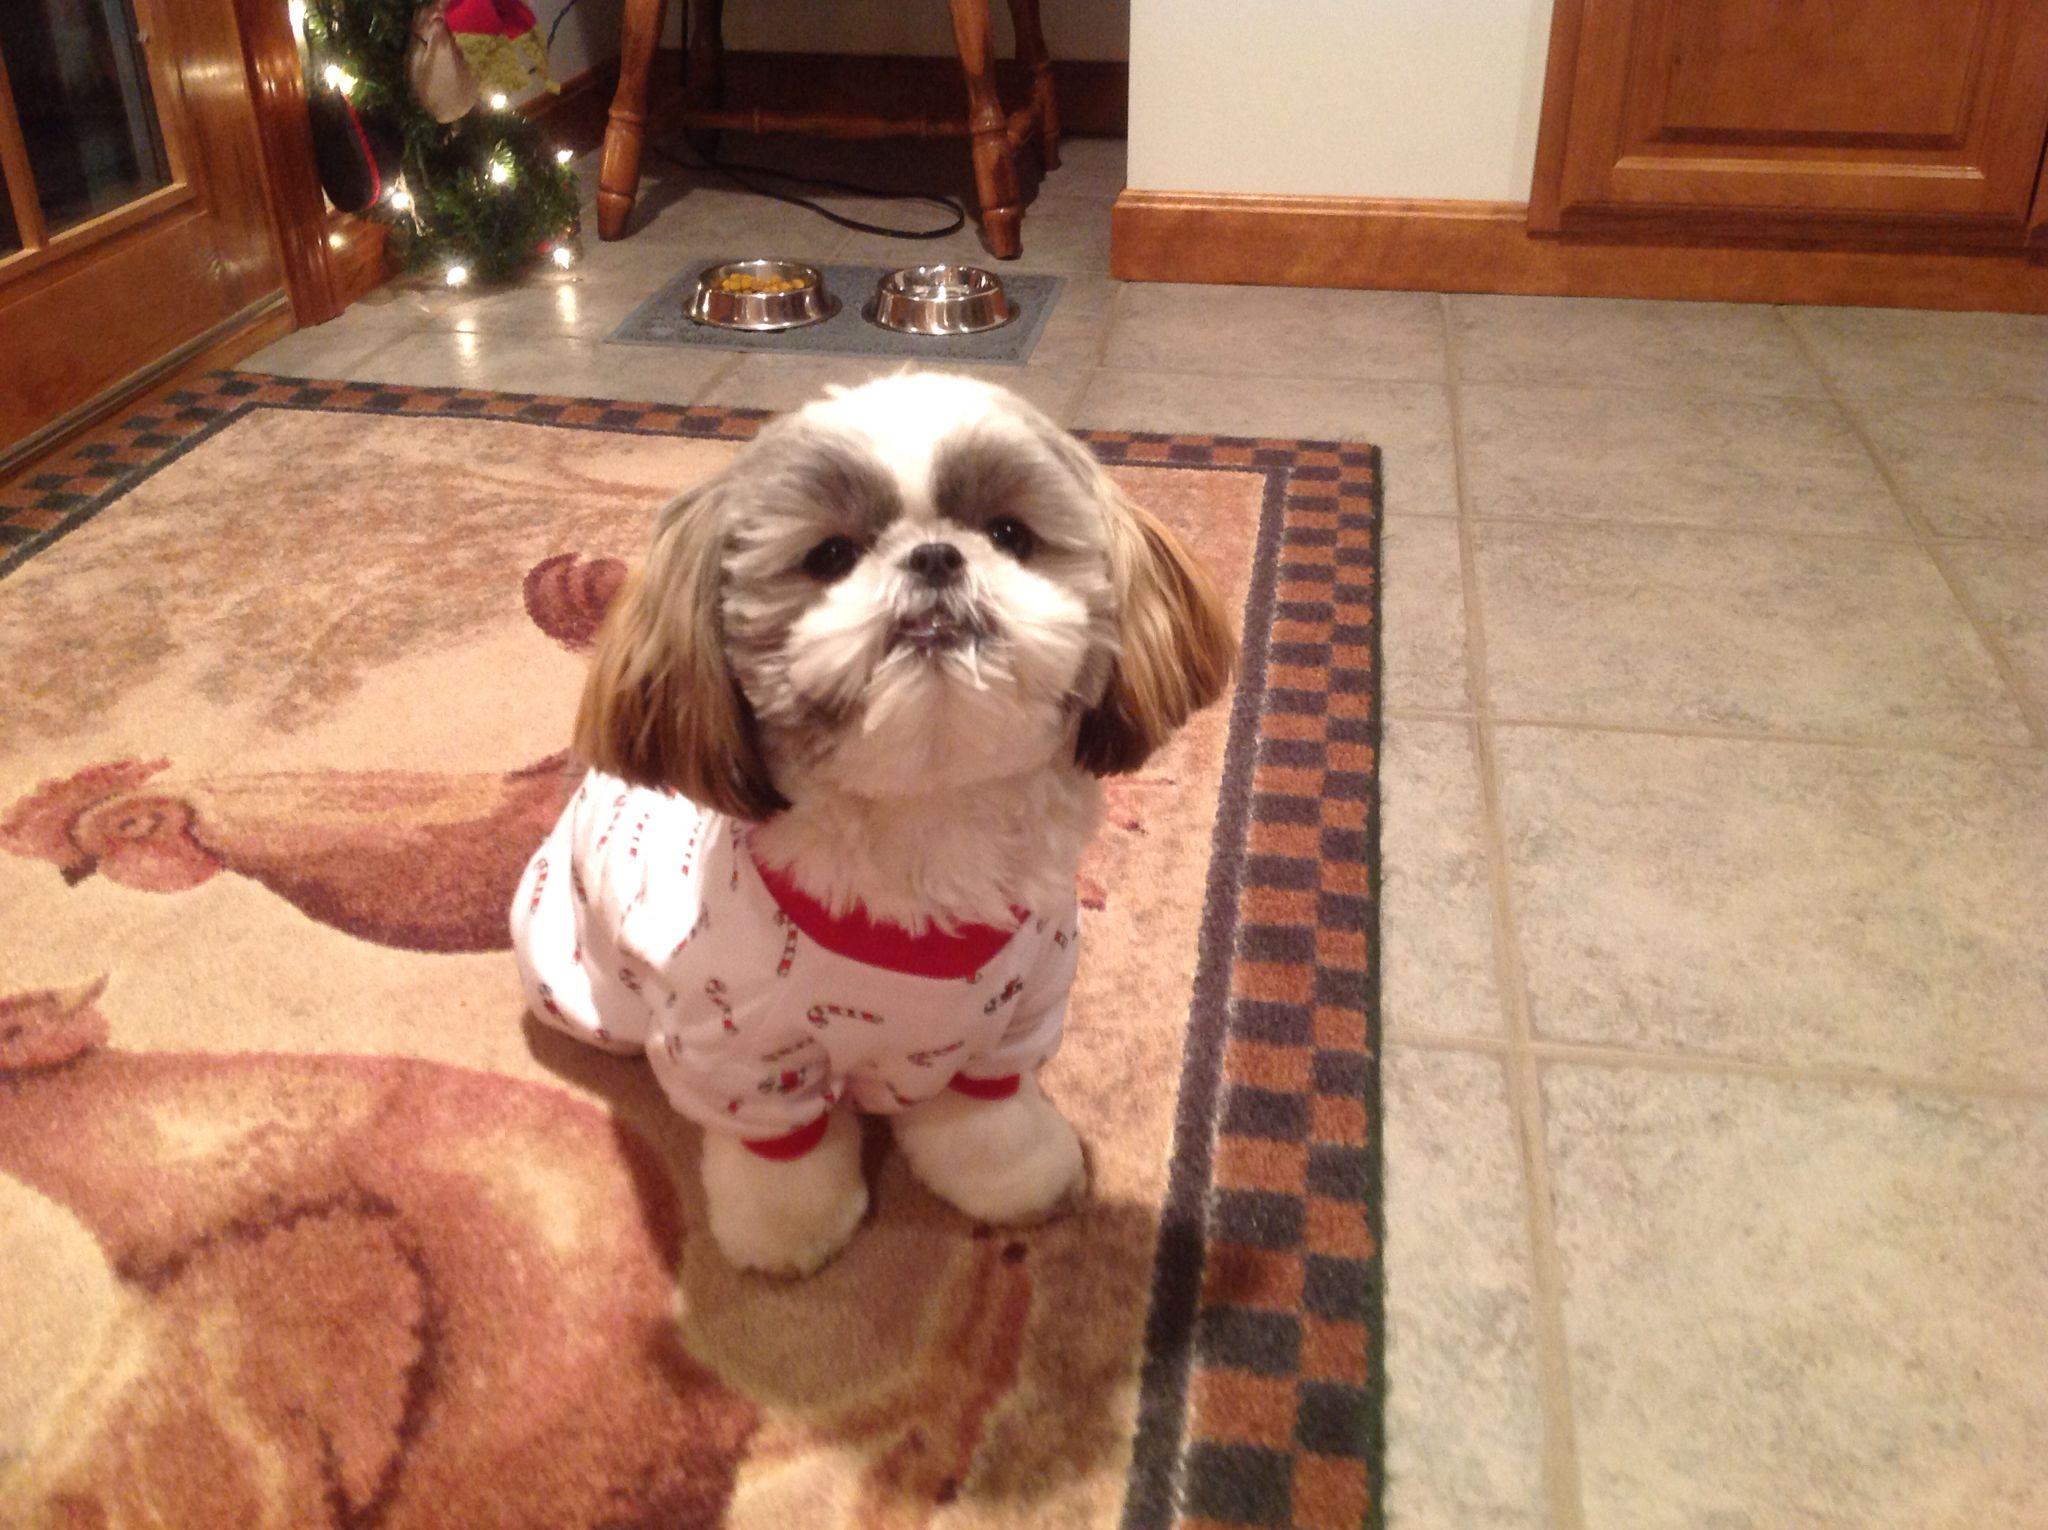 Shih Tzu Waiting For Santa Shih Tzu Puppy Shih Tzu Dog Shih Tzu